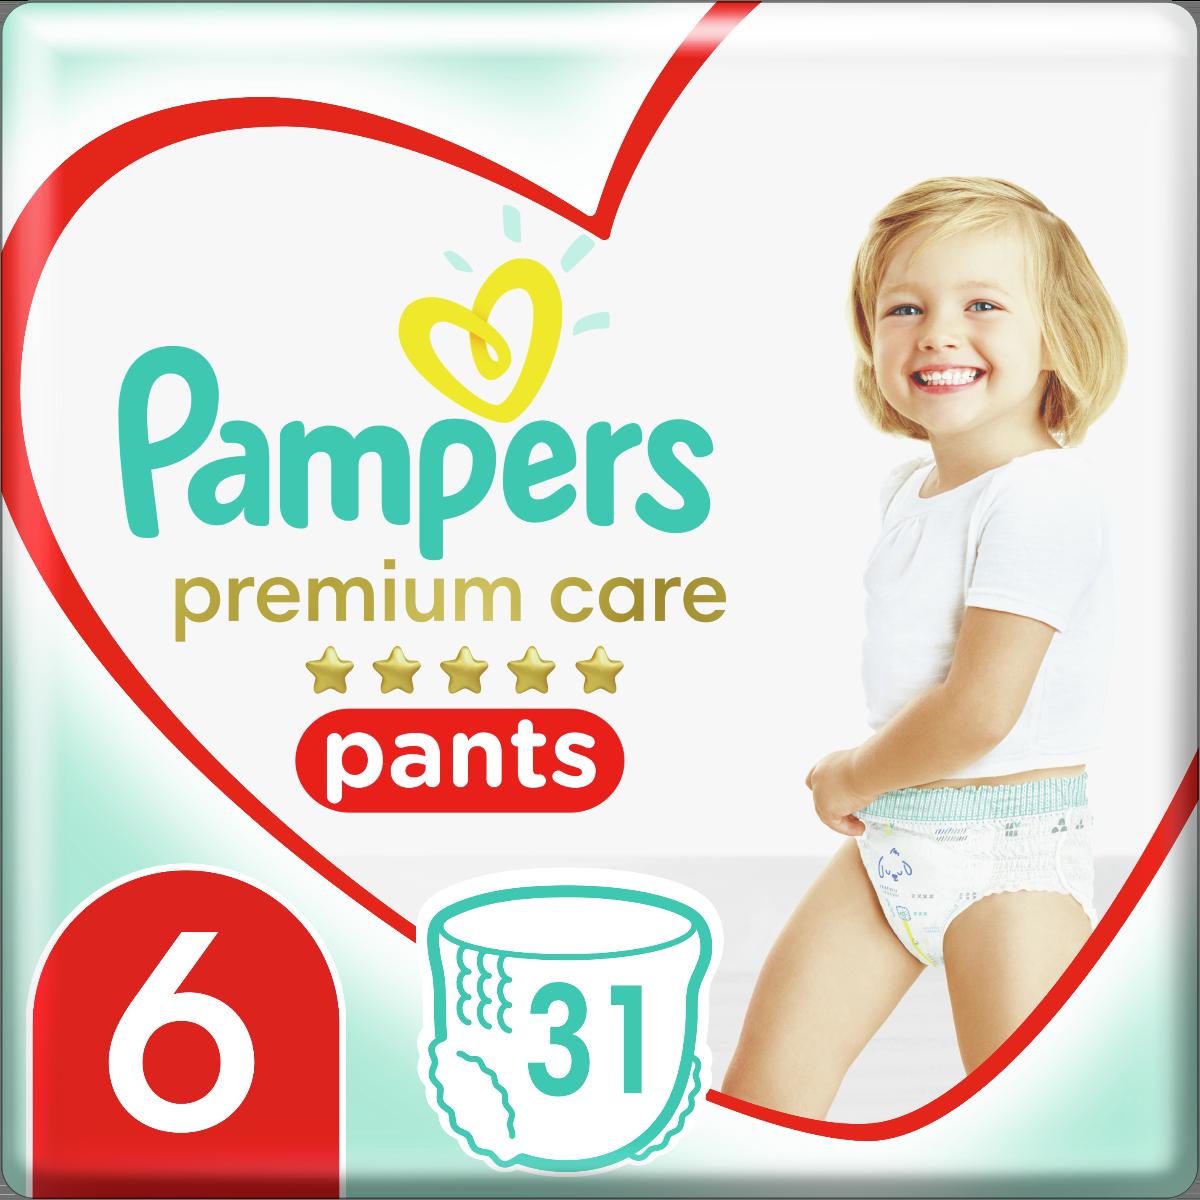 Pampers Πάνες Premium Care Pants Jumbo Pack Νo6 (15+kg) 31τεμ